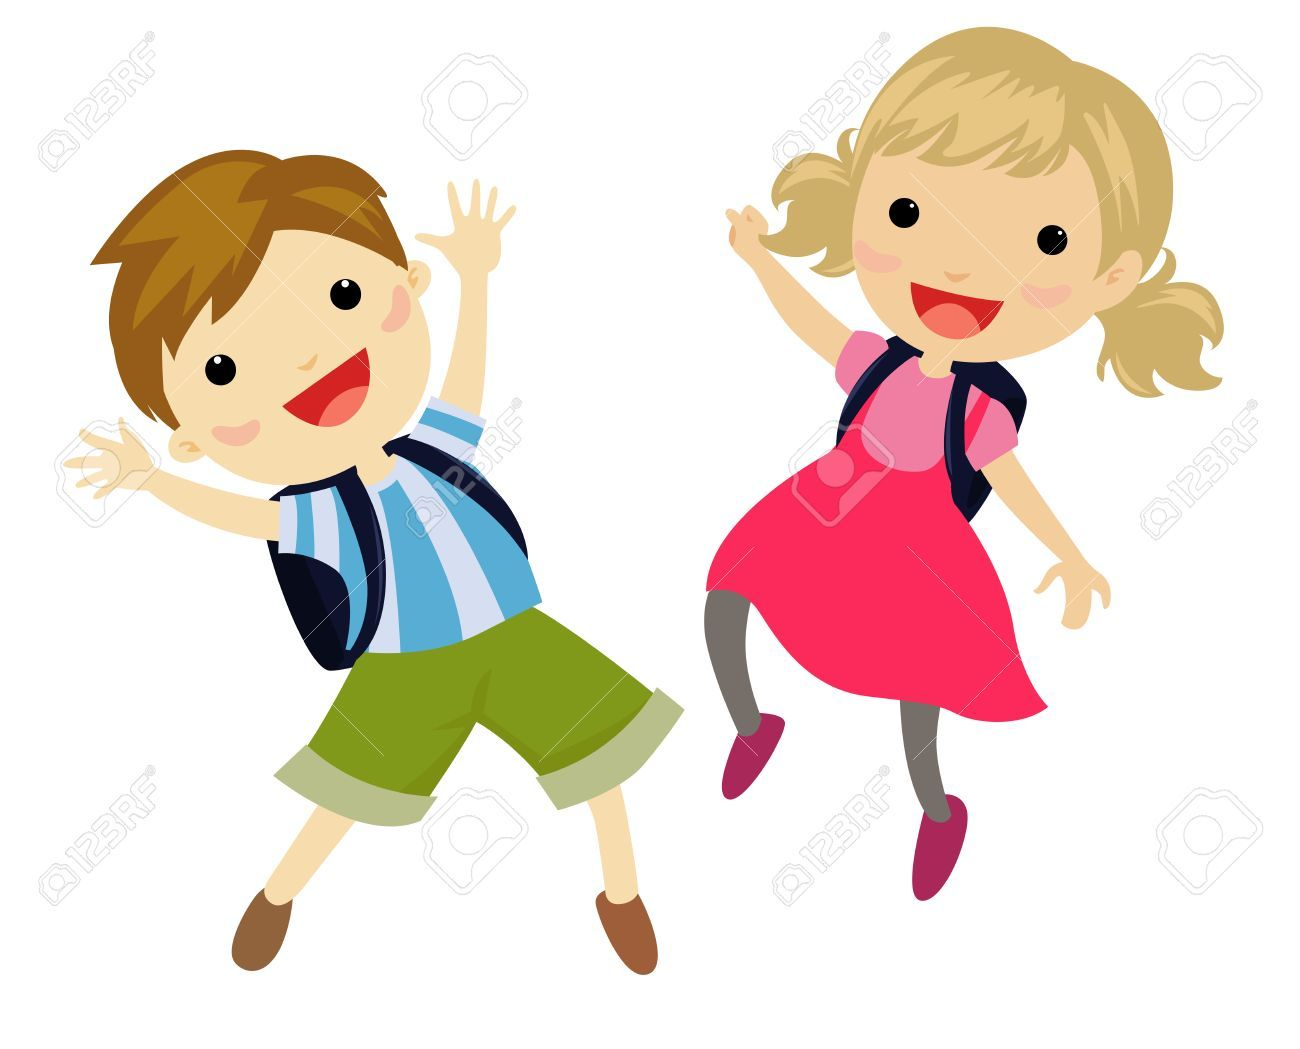 transparent stock Jumping clipart 1 kid. Kids portal .